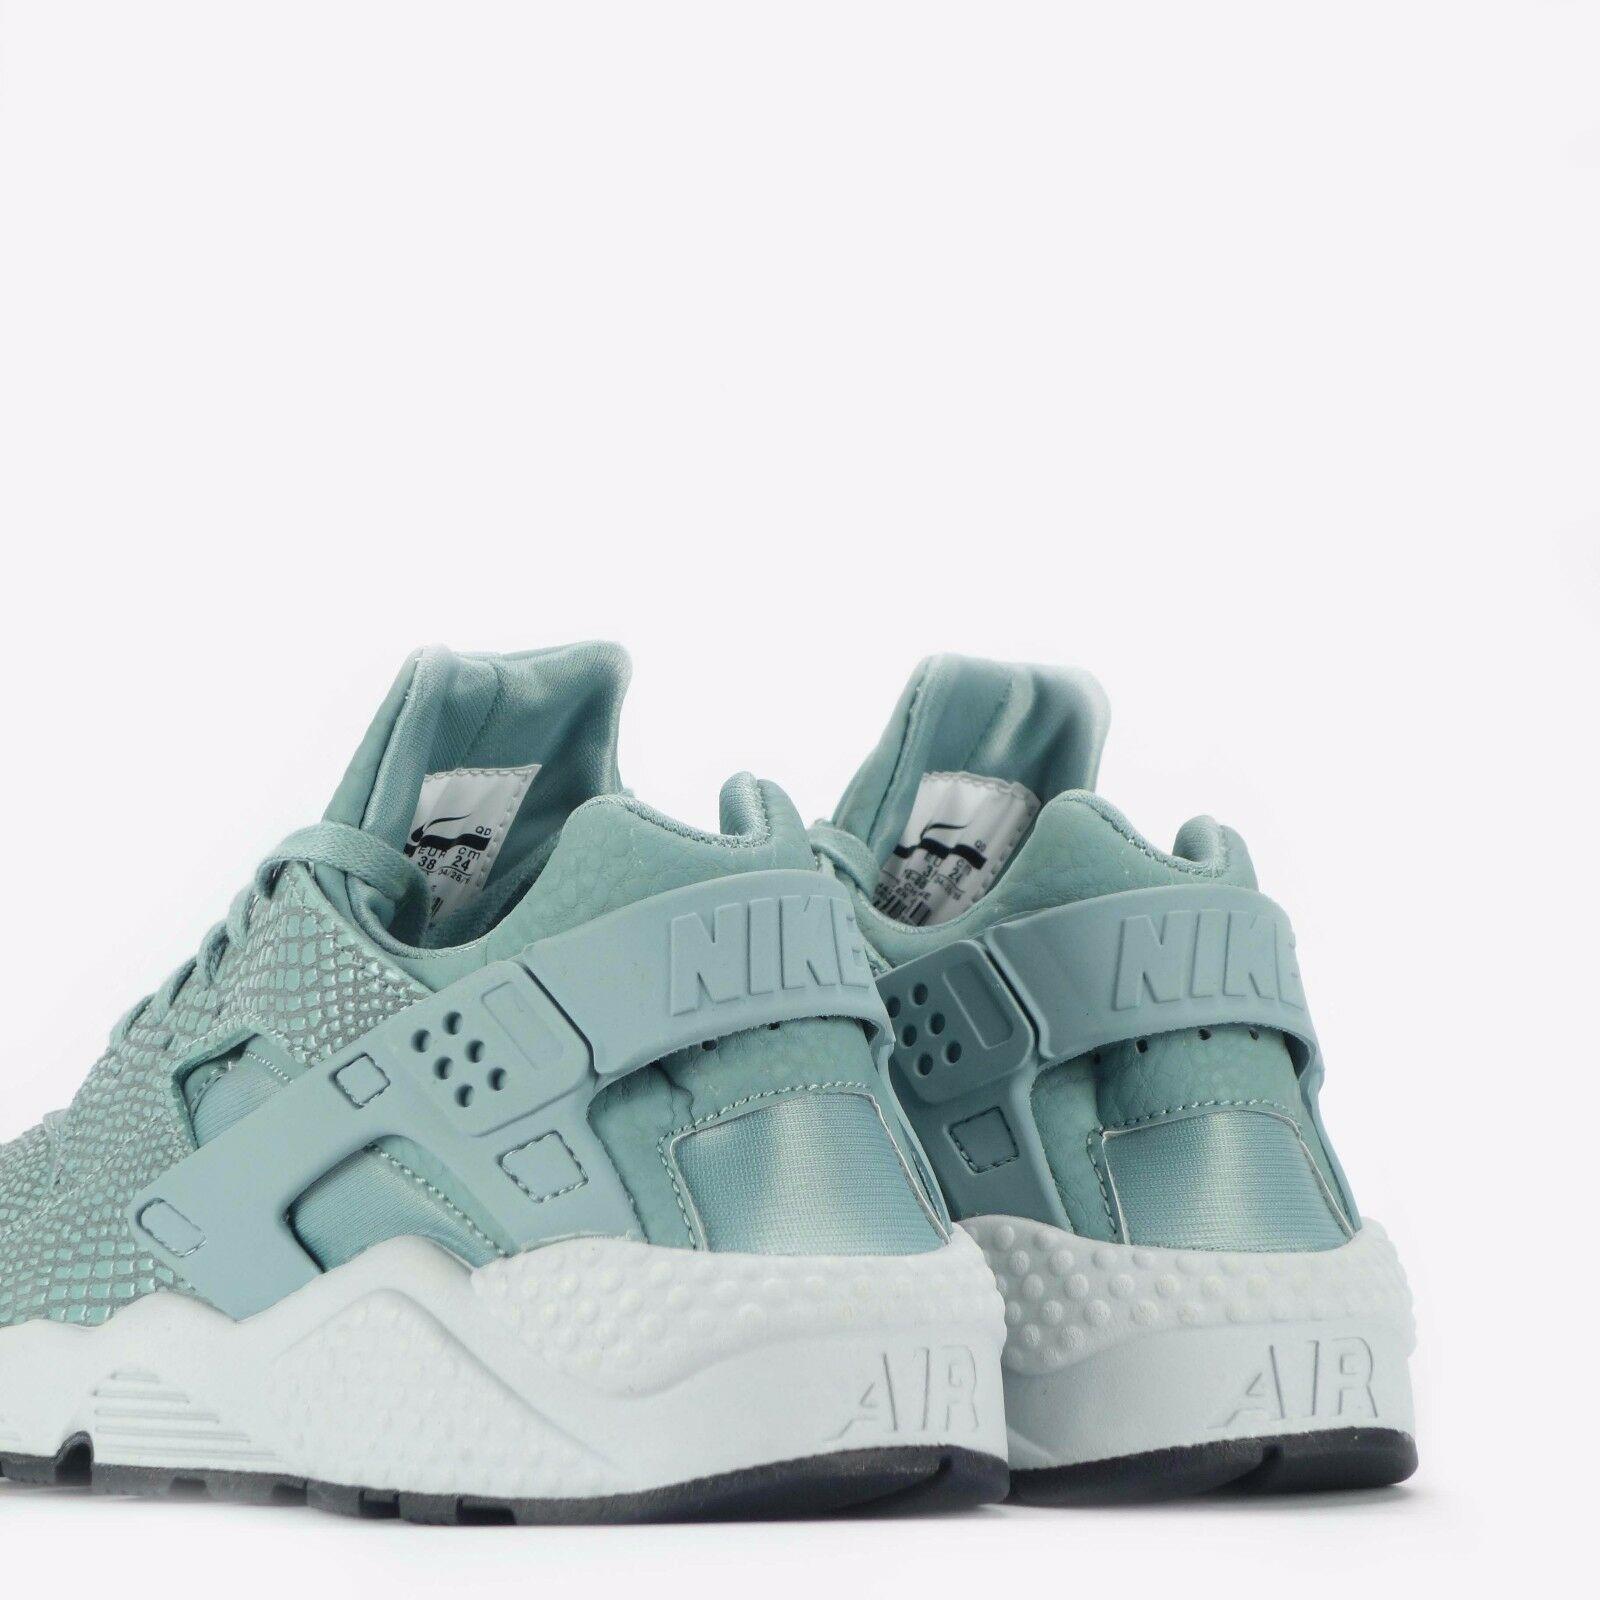 best sneakers b03eb f371b ... Nike Air Huarache Run Print Women s Shoes in in in Cannon Pure Platinum  5a8a0a